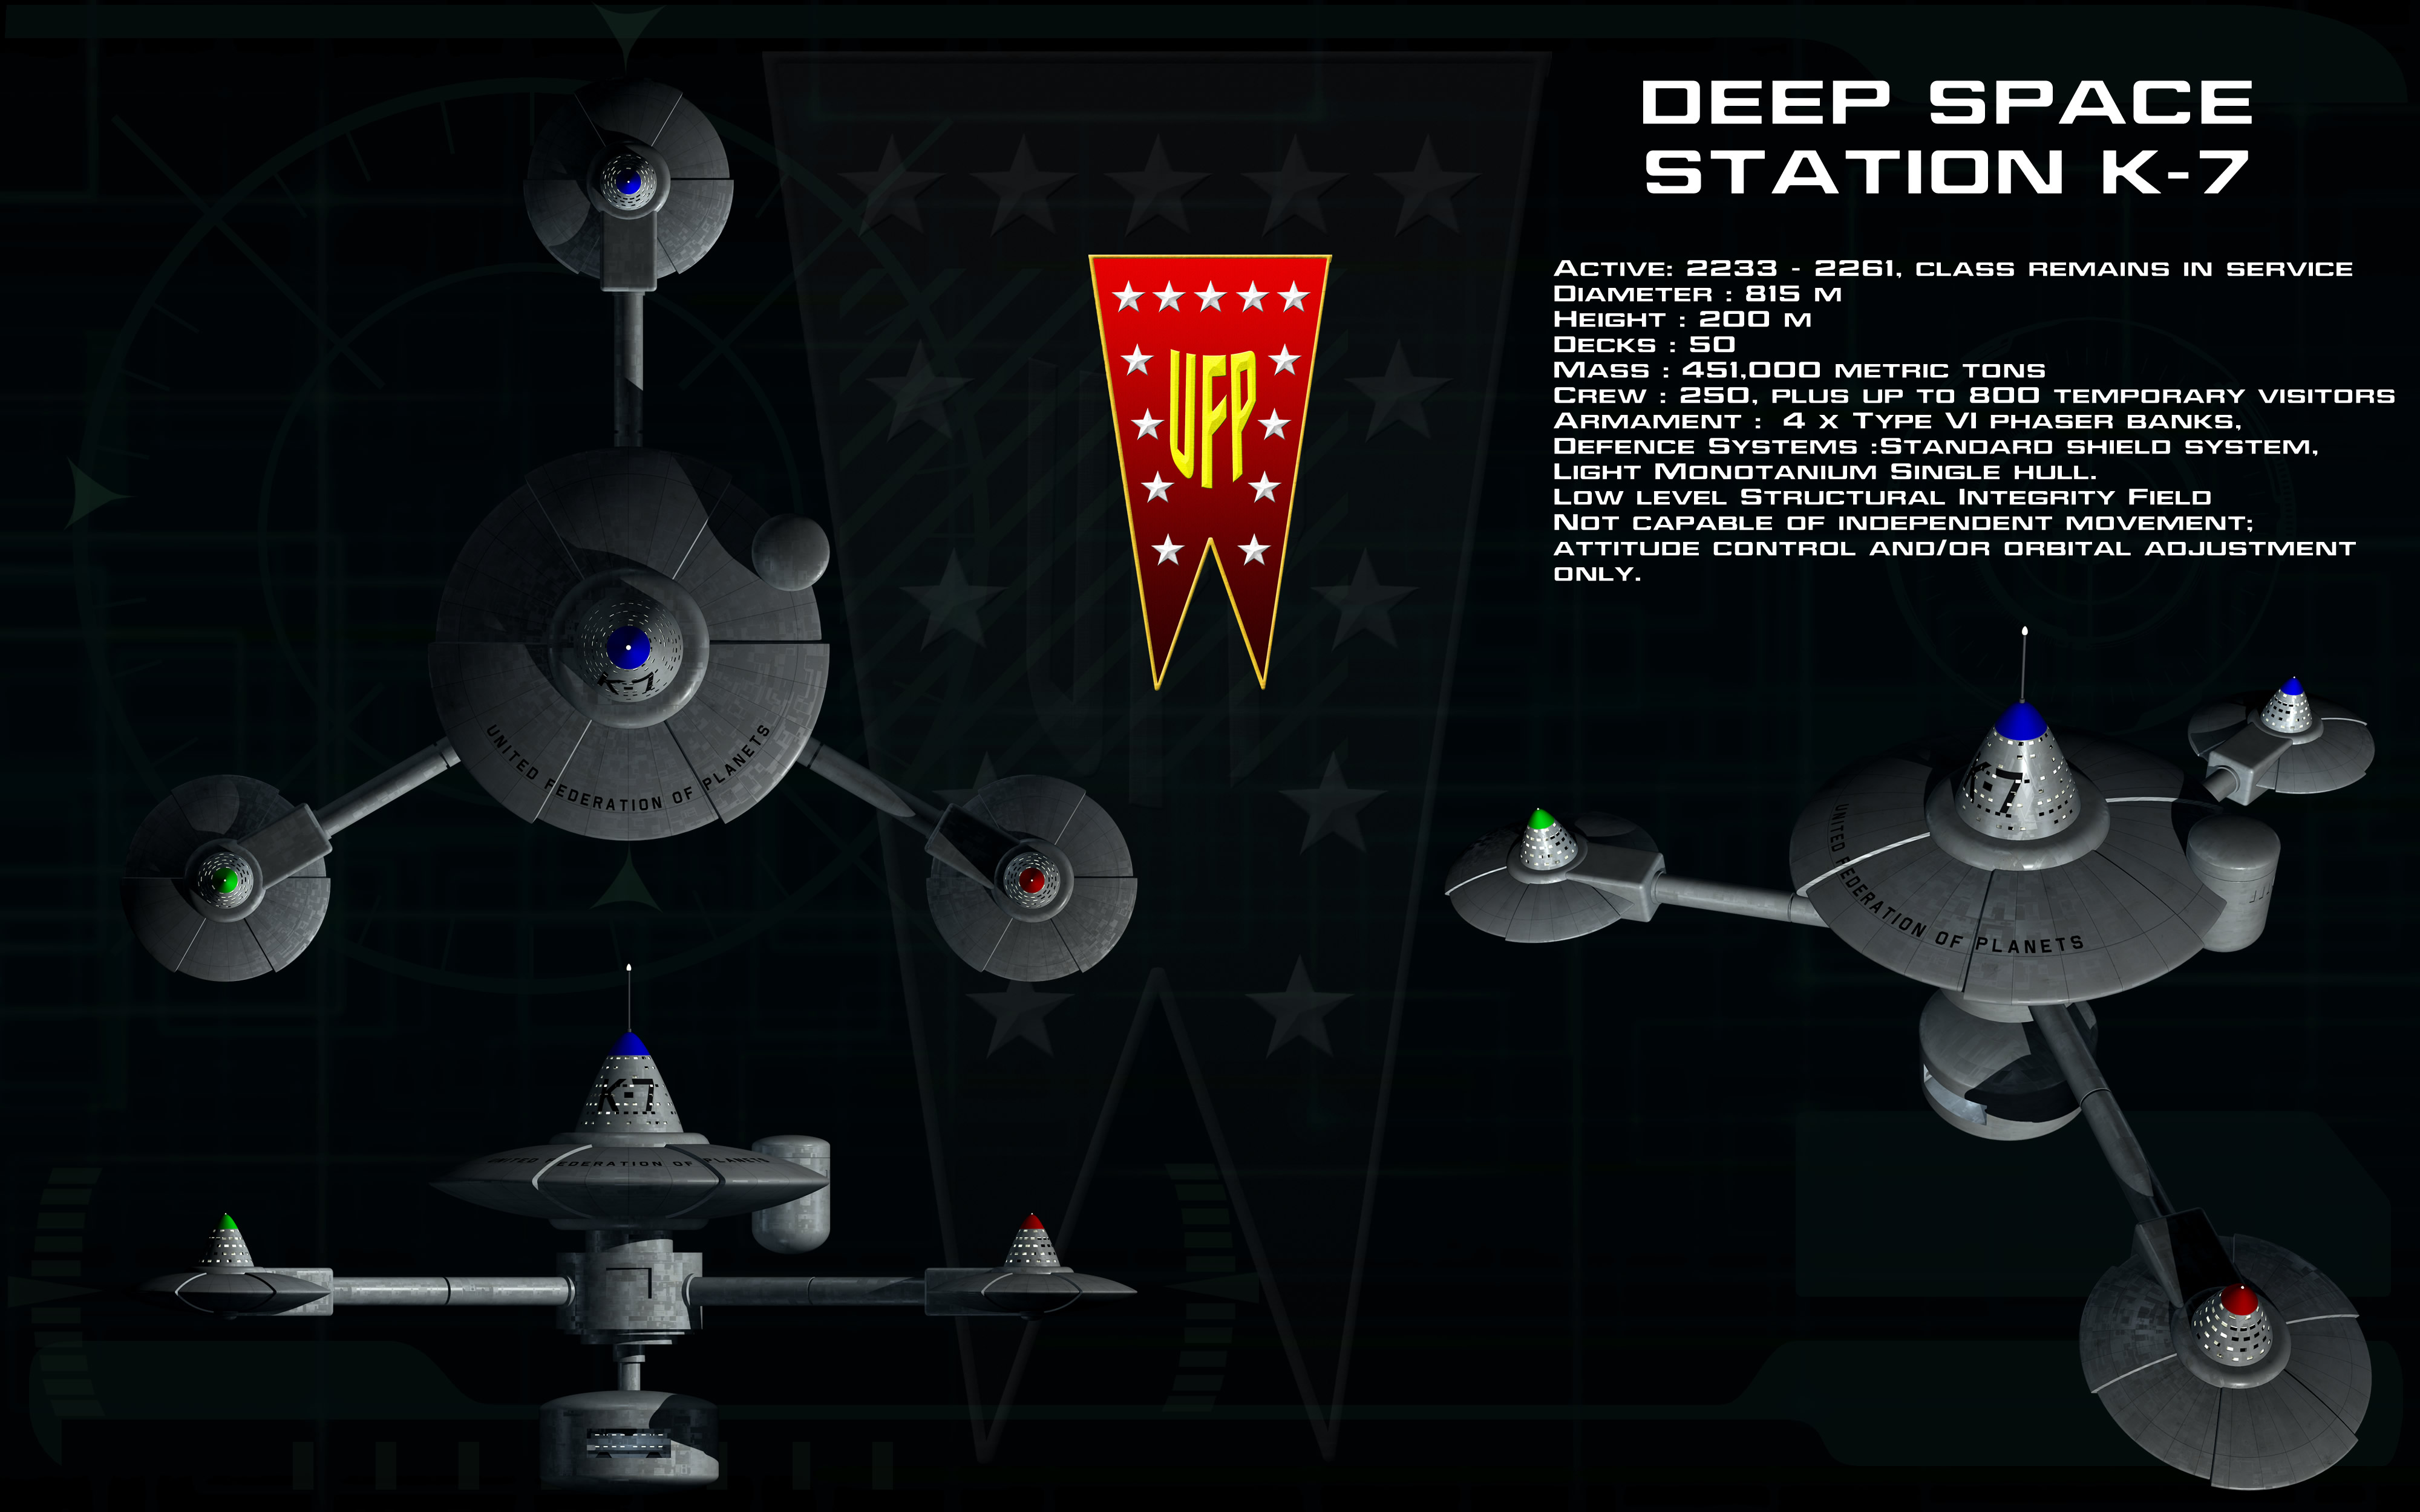 Deep Space Station K-7 ortho by unusualsuspex on DeviantArt